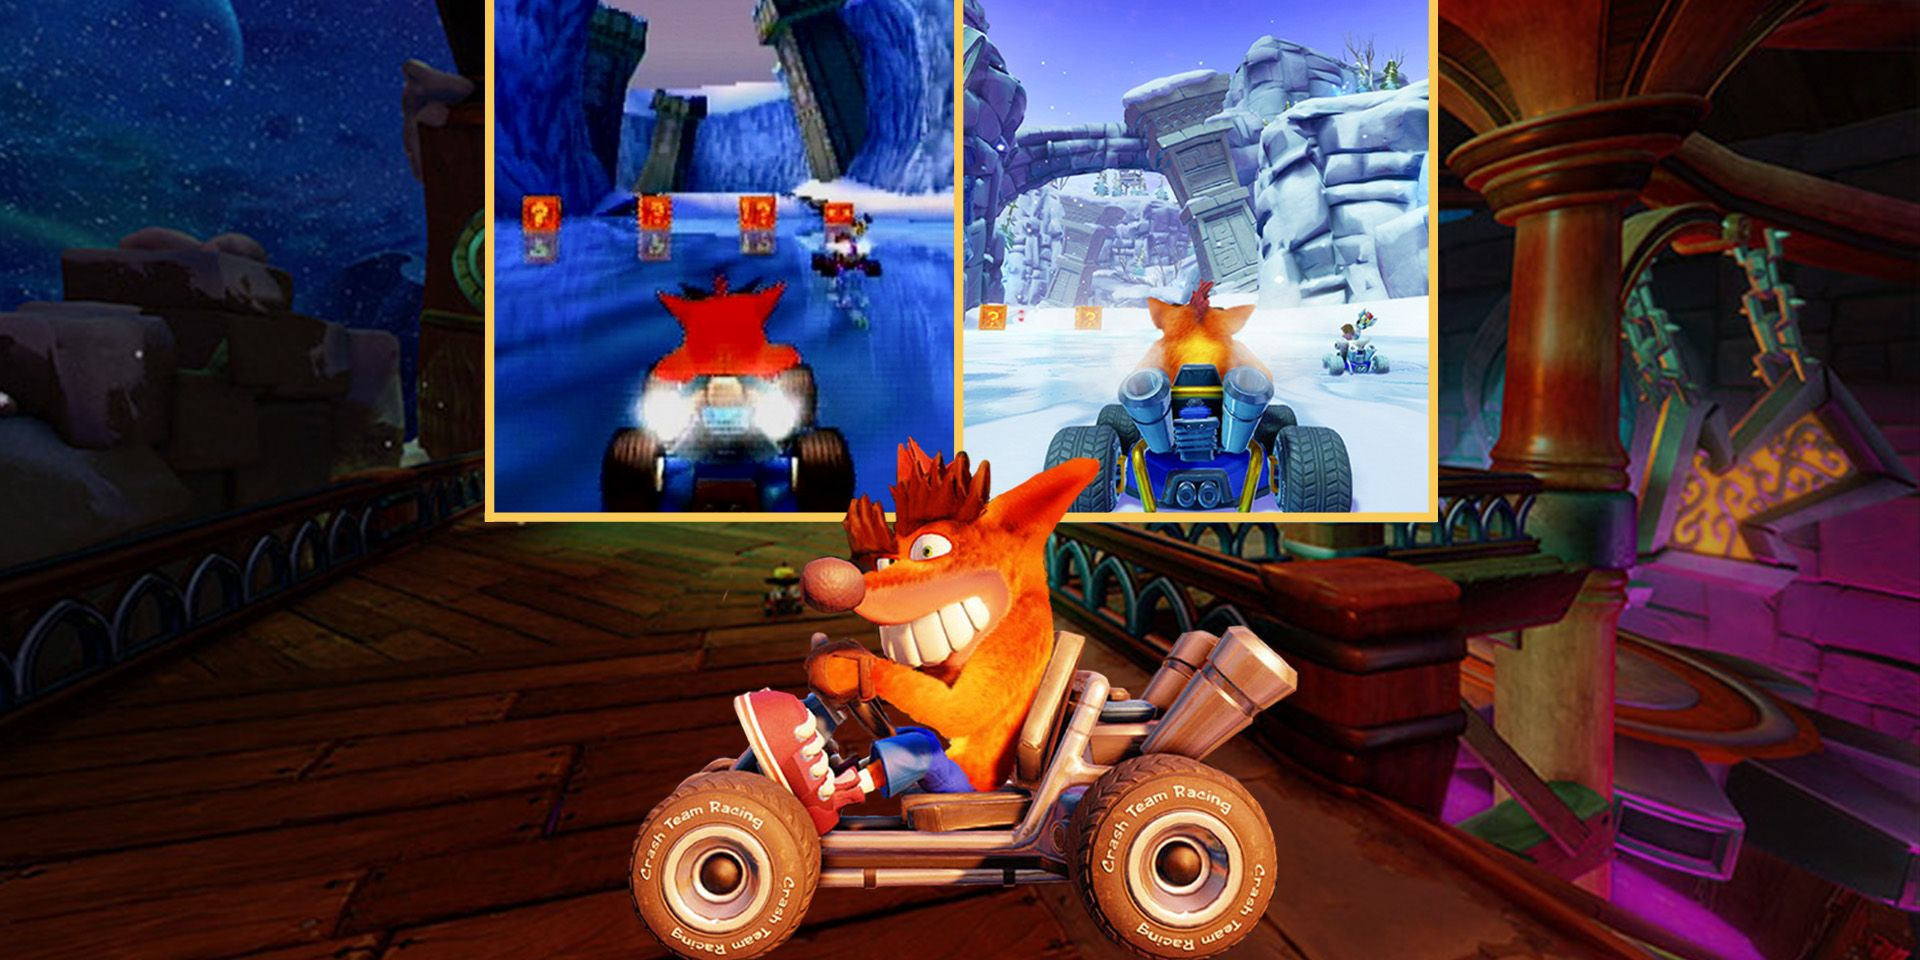 Crash Team Racing Nitro-Fueled Review - Crash Bandicoot Video Game